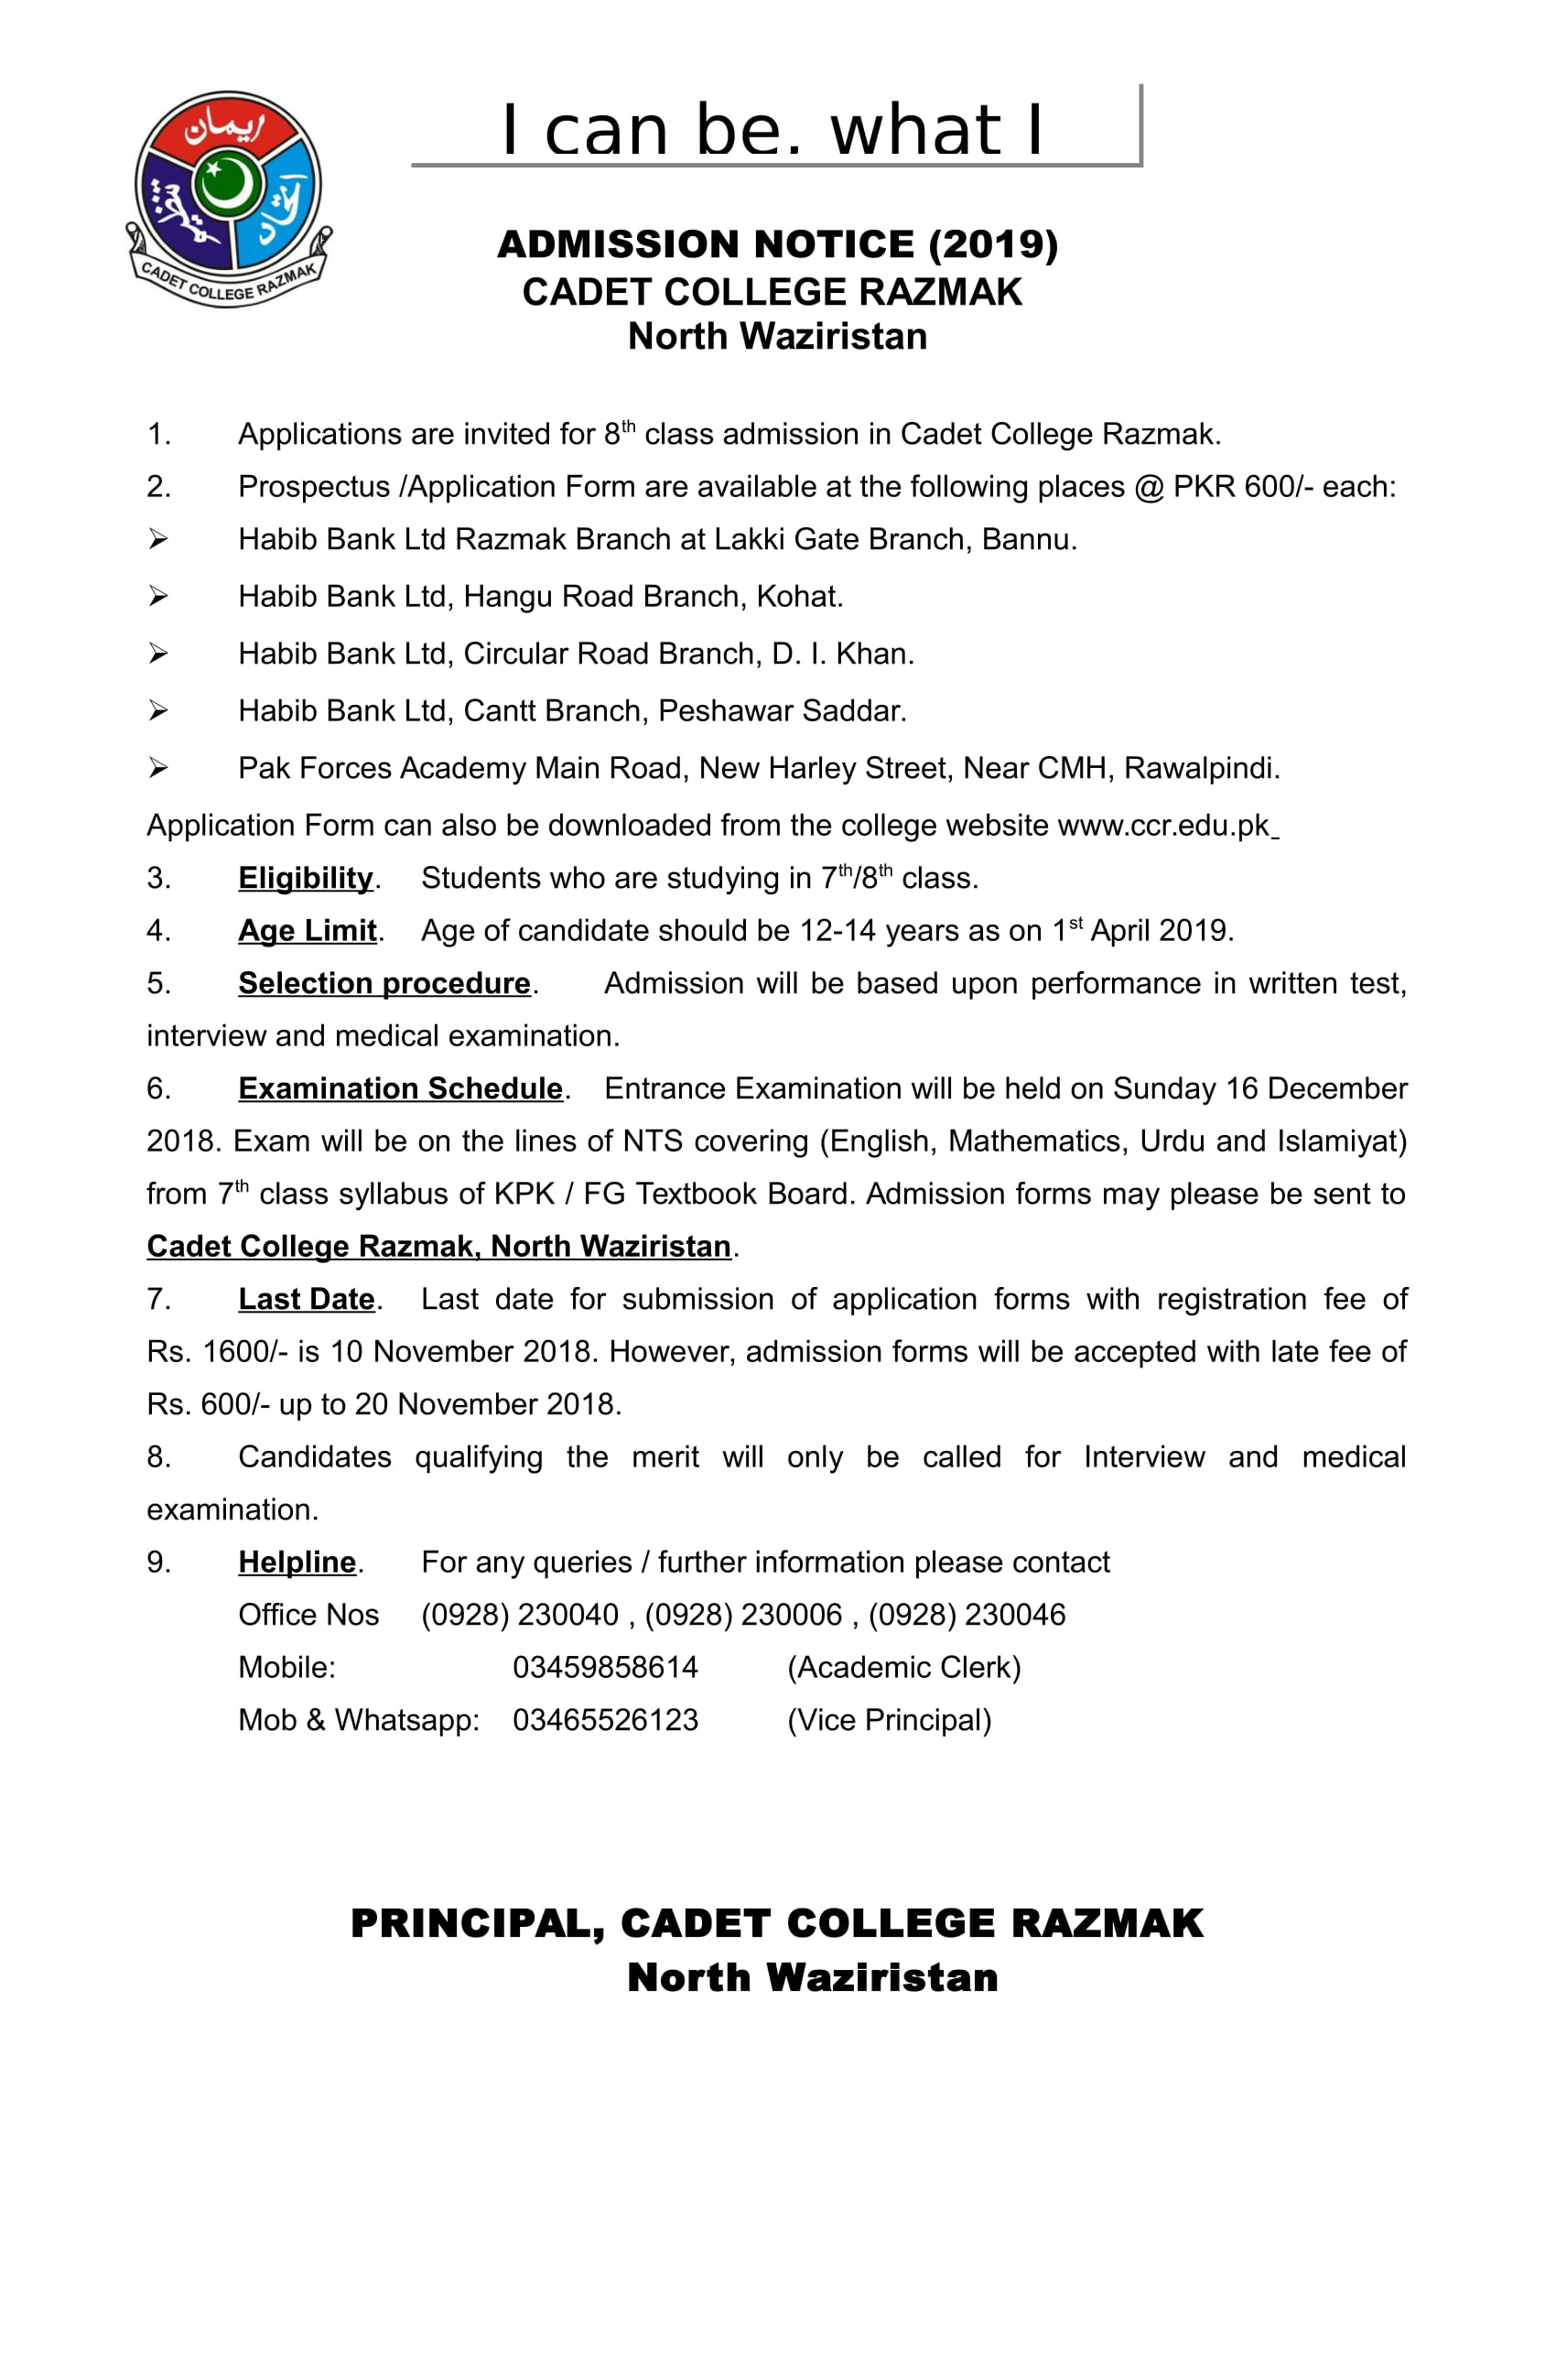 Cadet College Razmak Admission 2019 Form